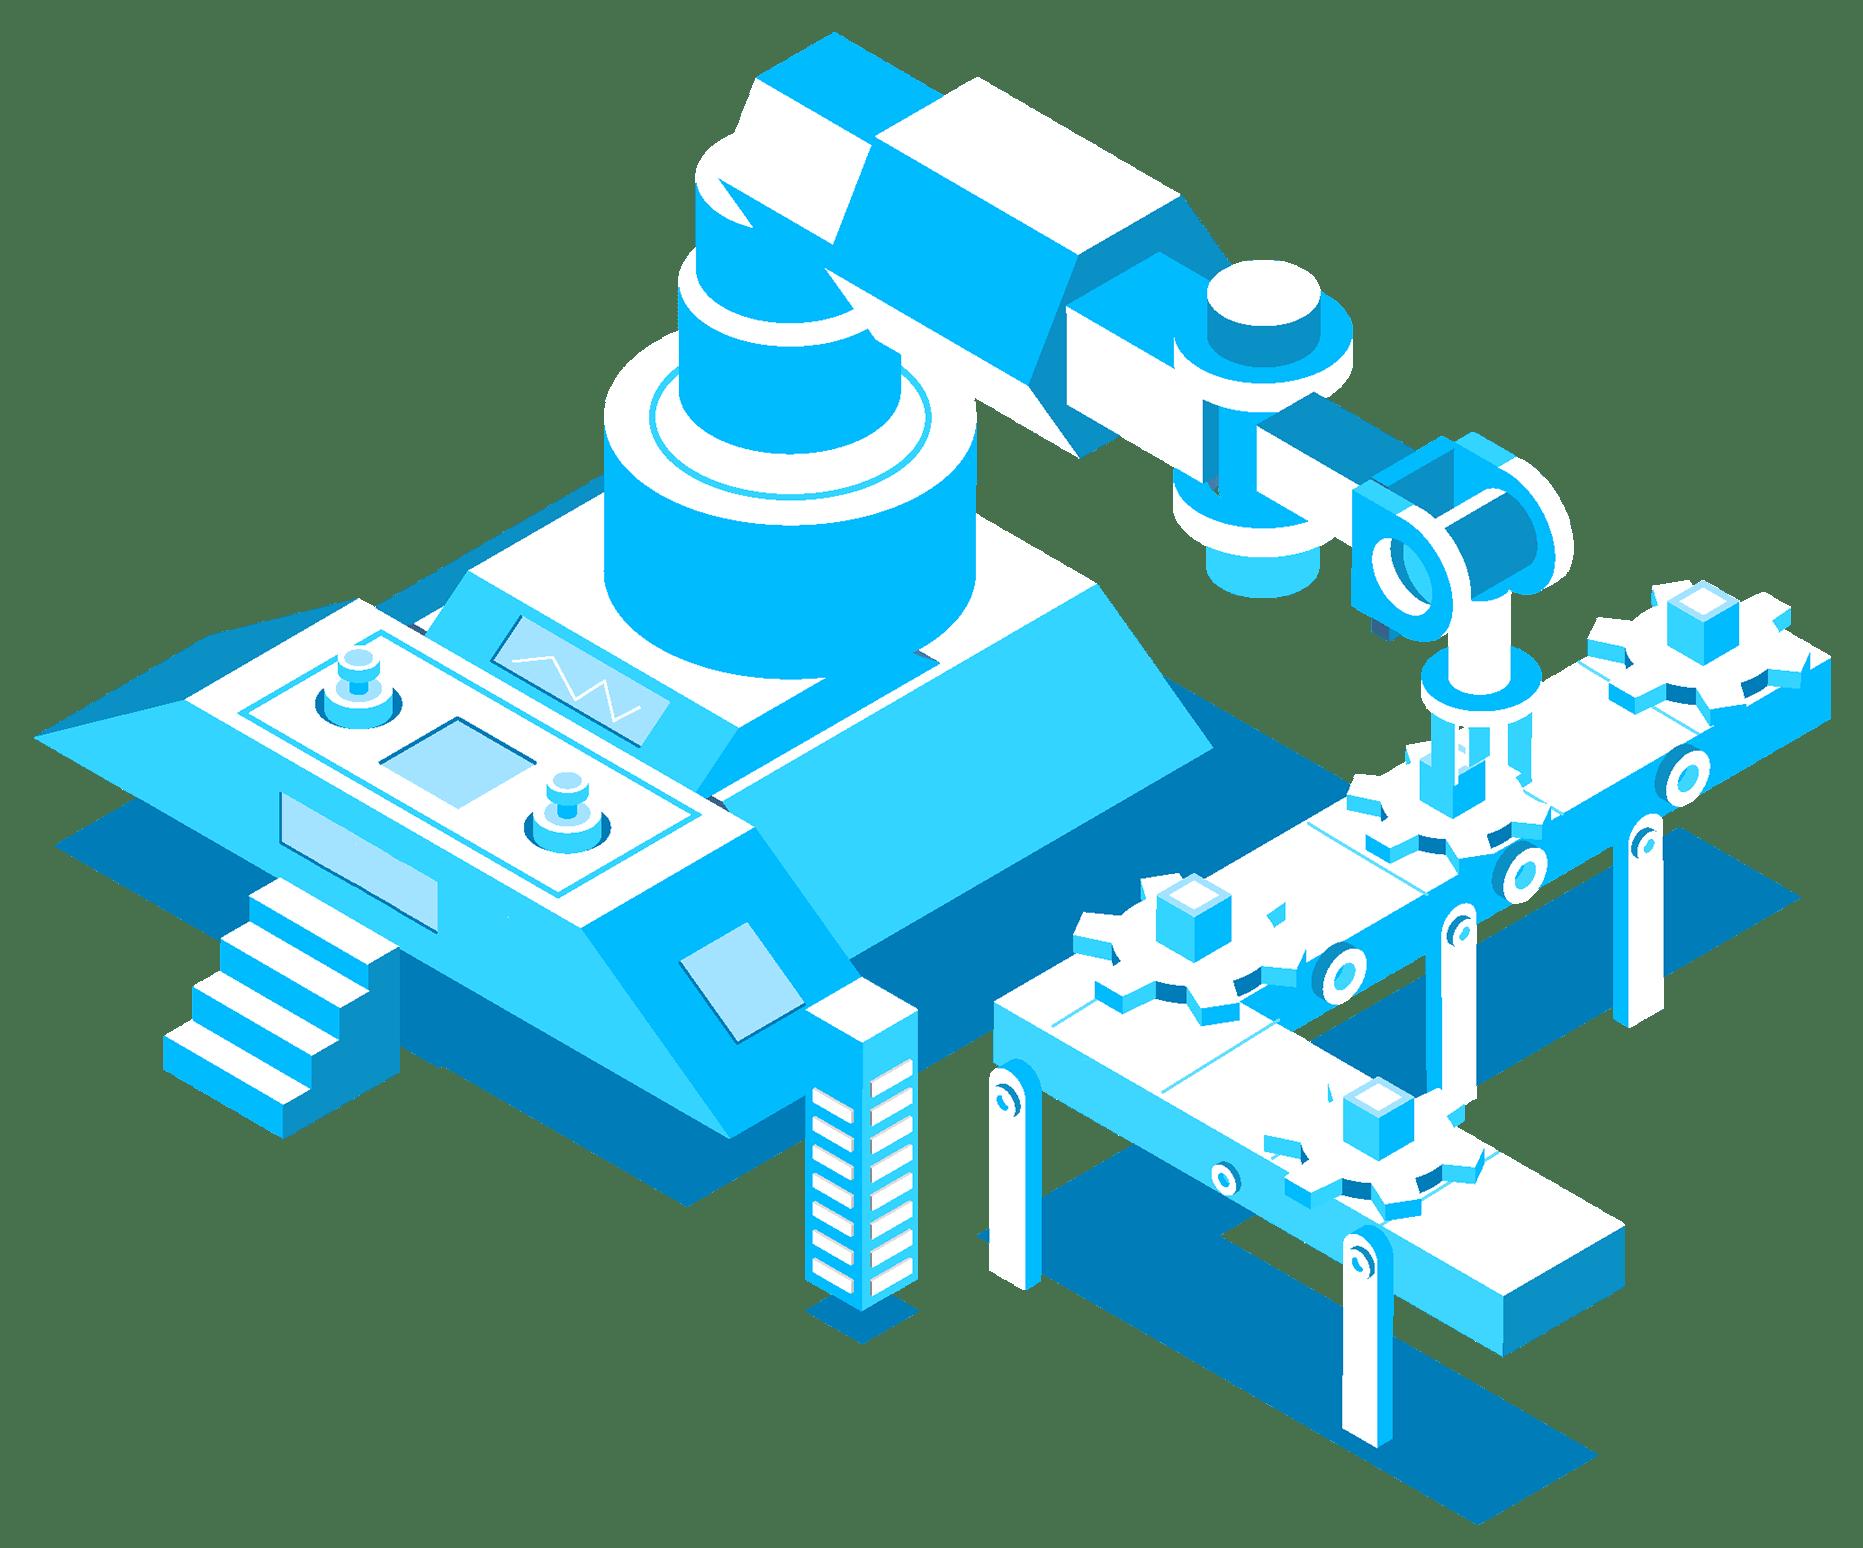 pngtreemanufacturing-artificial-intelligence-robot-element_4034248-min